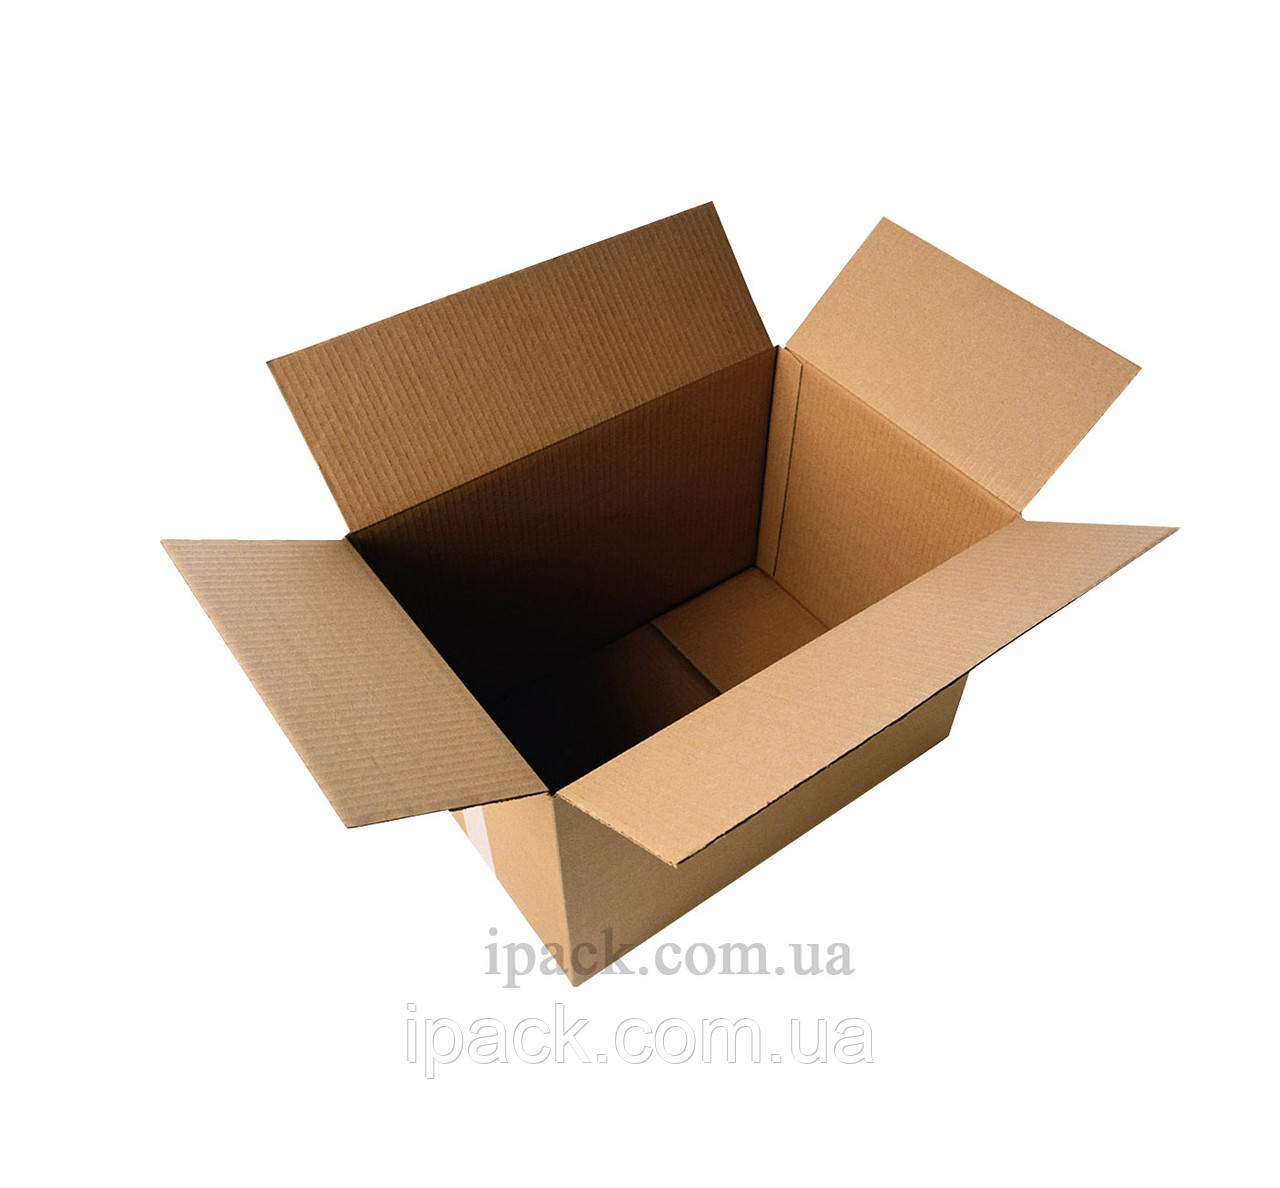 Гофроящик 550*295*350 мм, бурый, четырехклапанный картонный короб